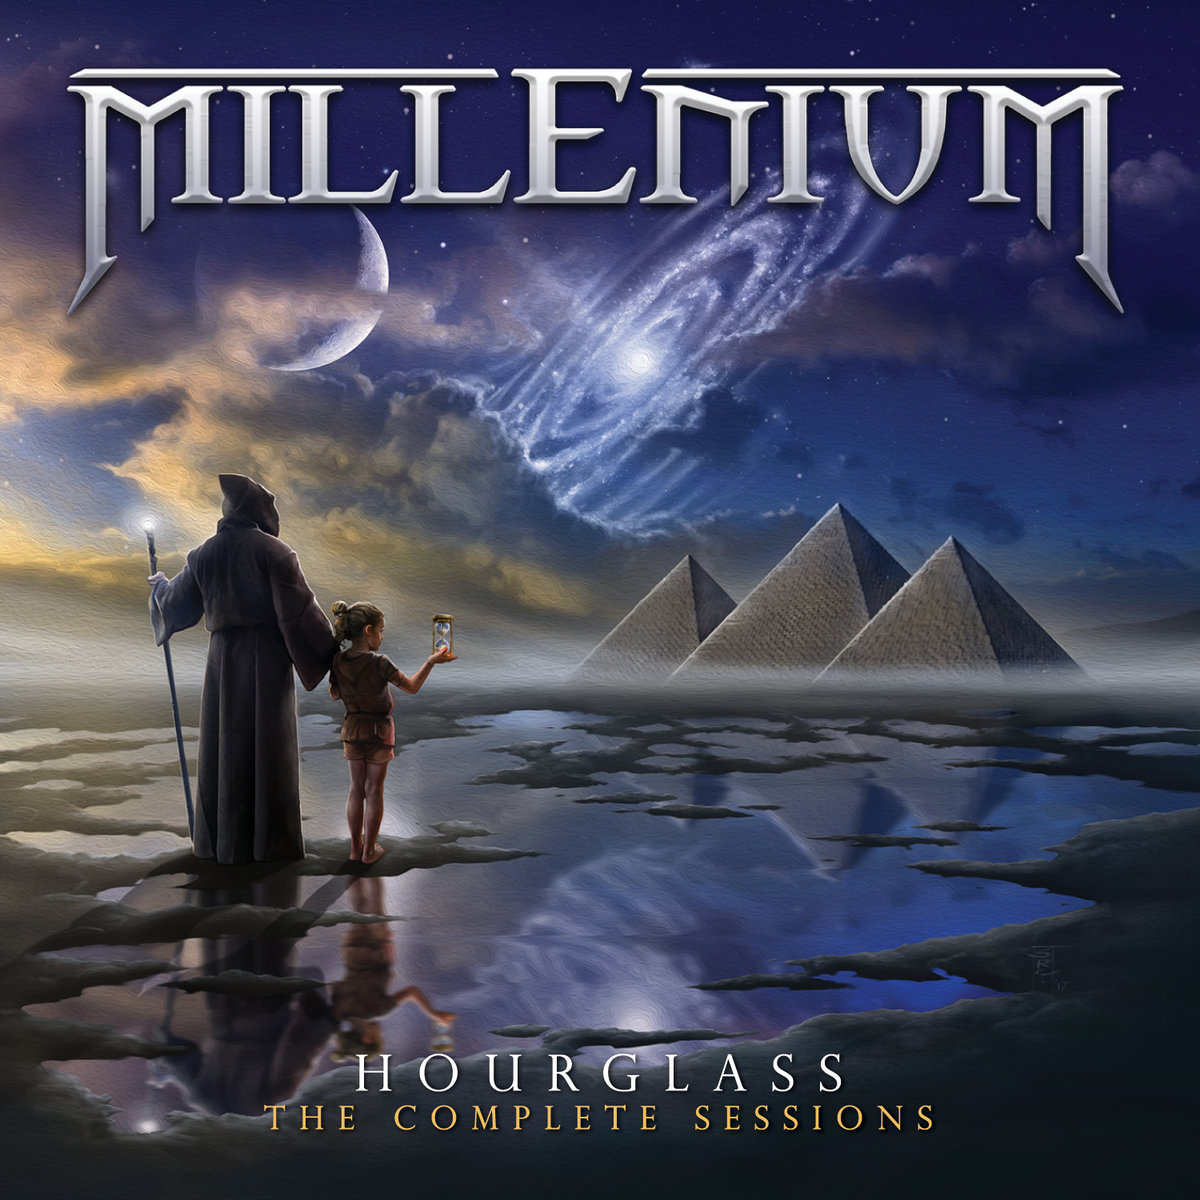 millenium hourglass